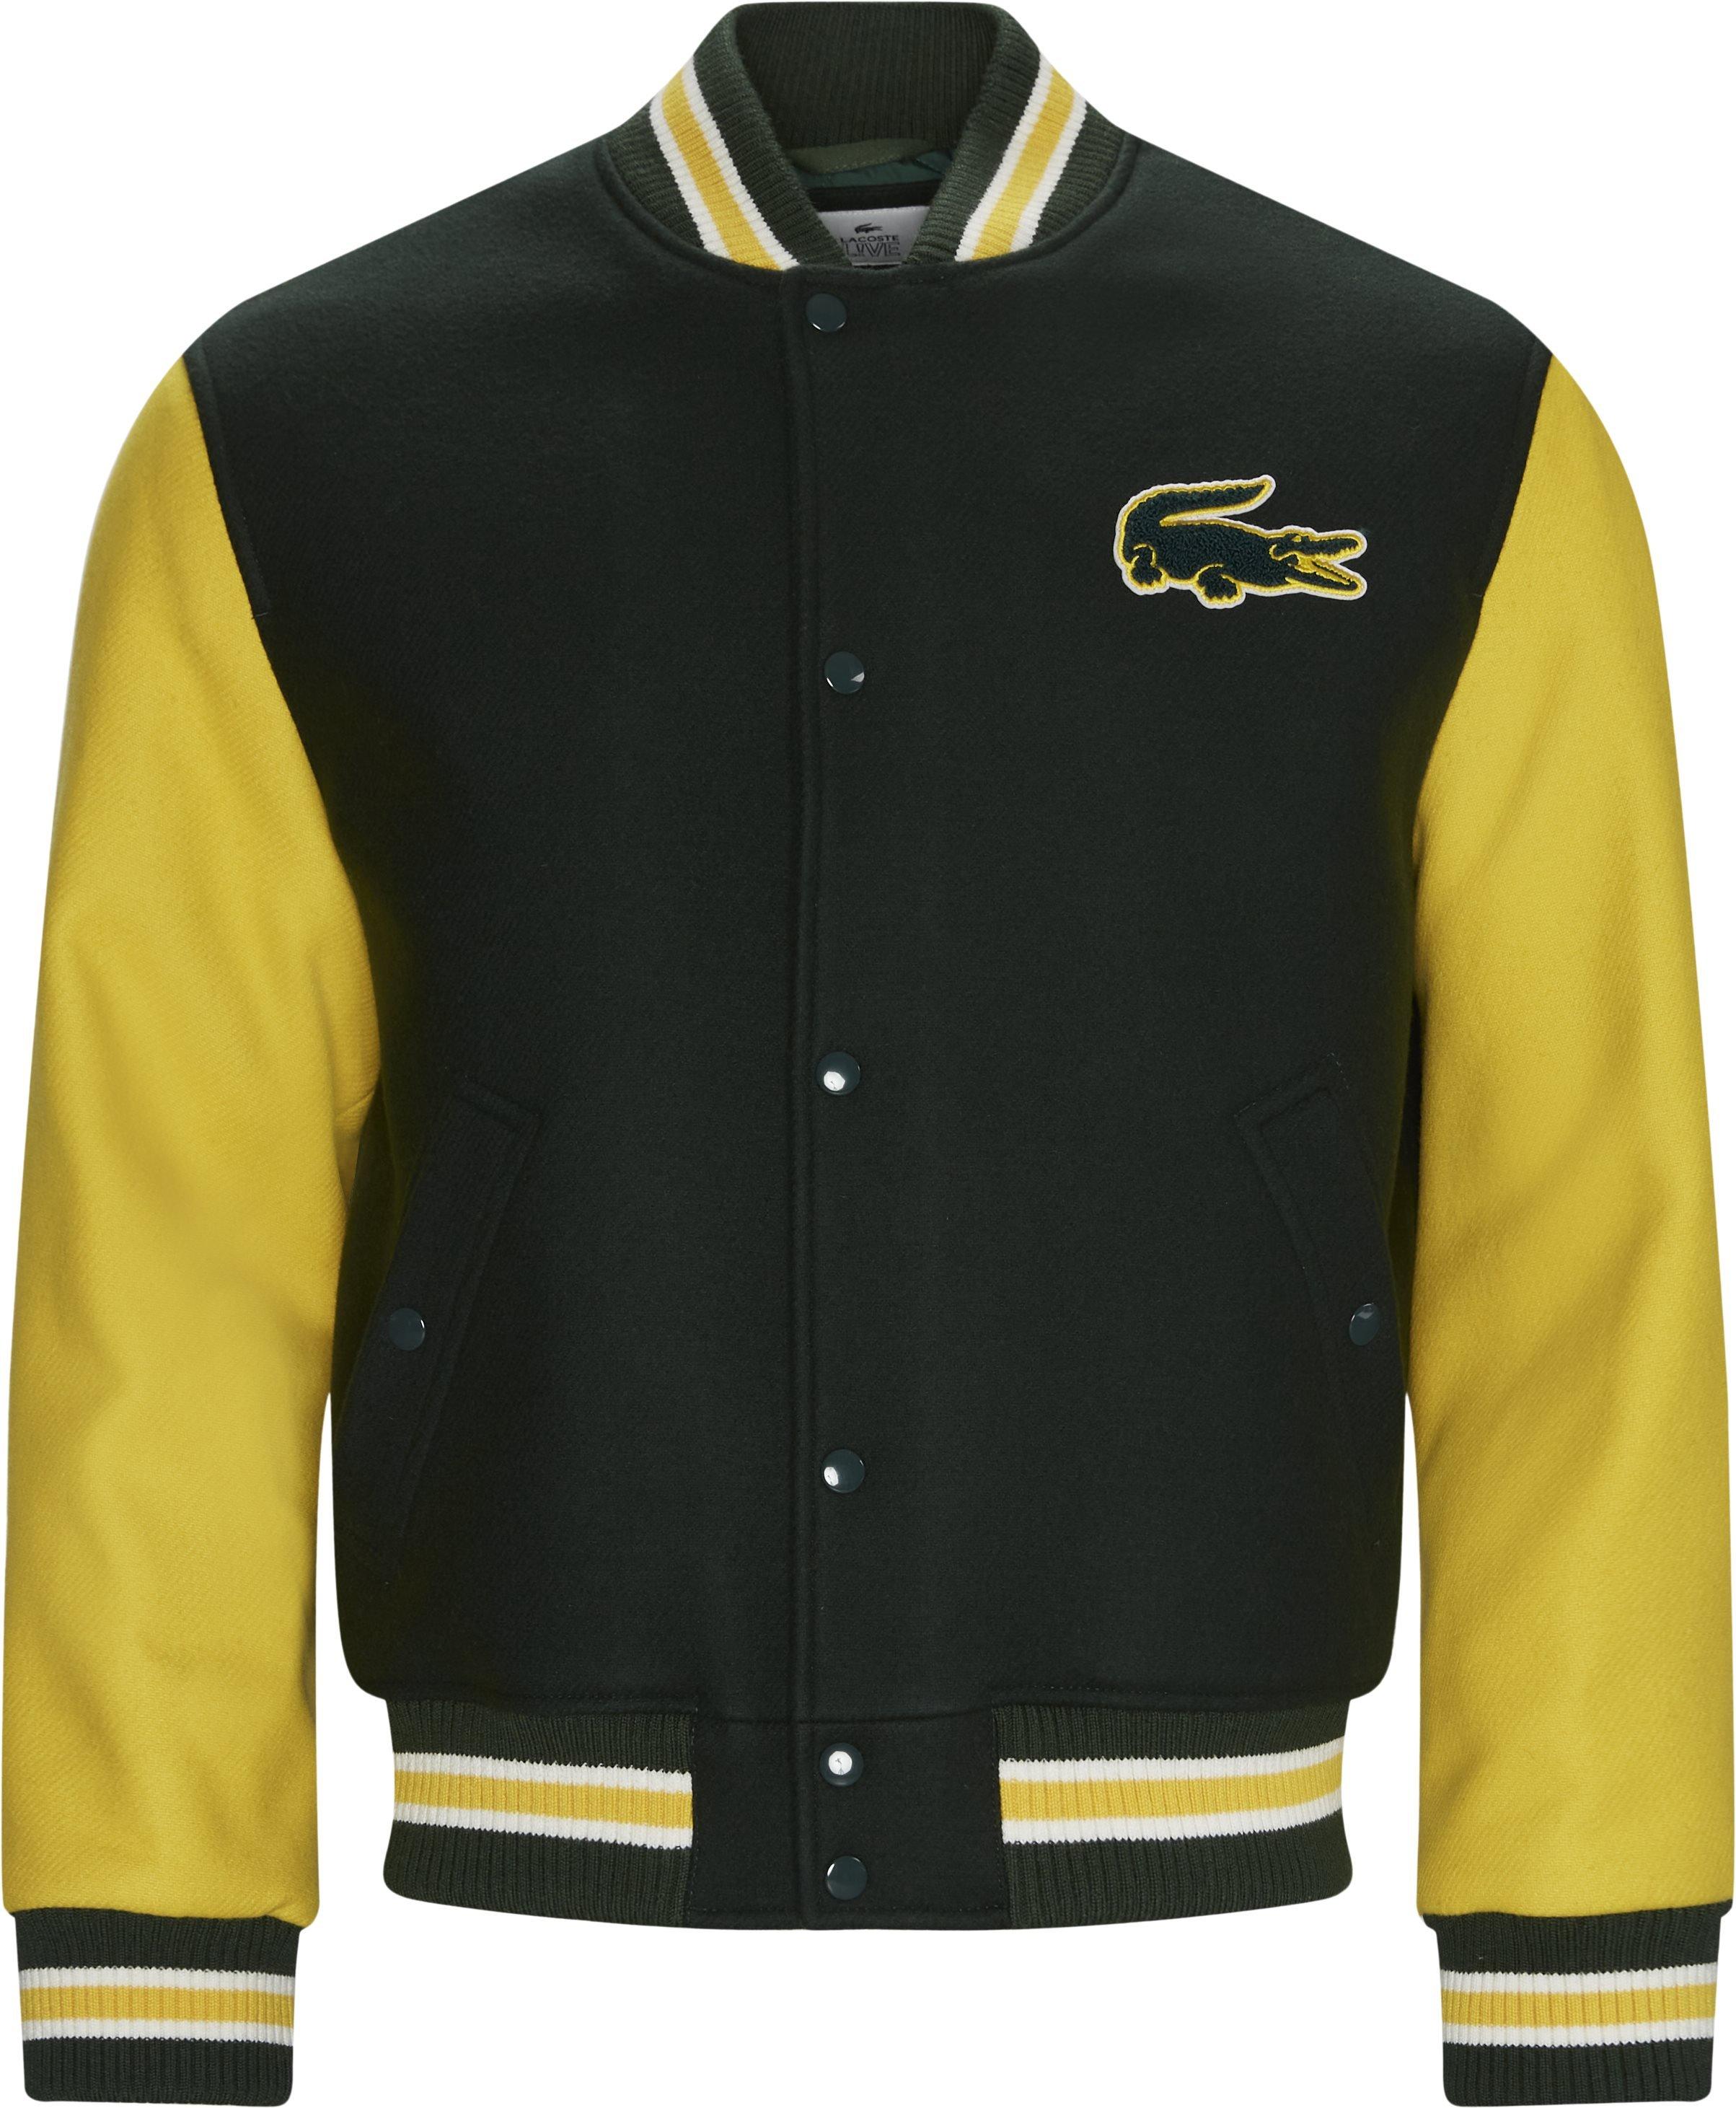 Two-Tone Wool Blend Bomber Jacket - Jackor - Regular - Grön